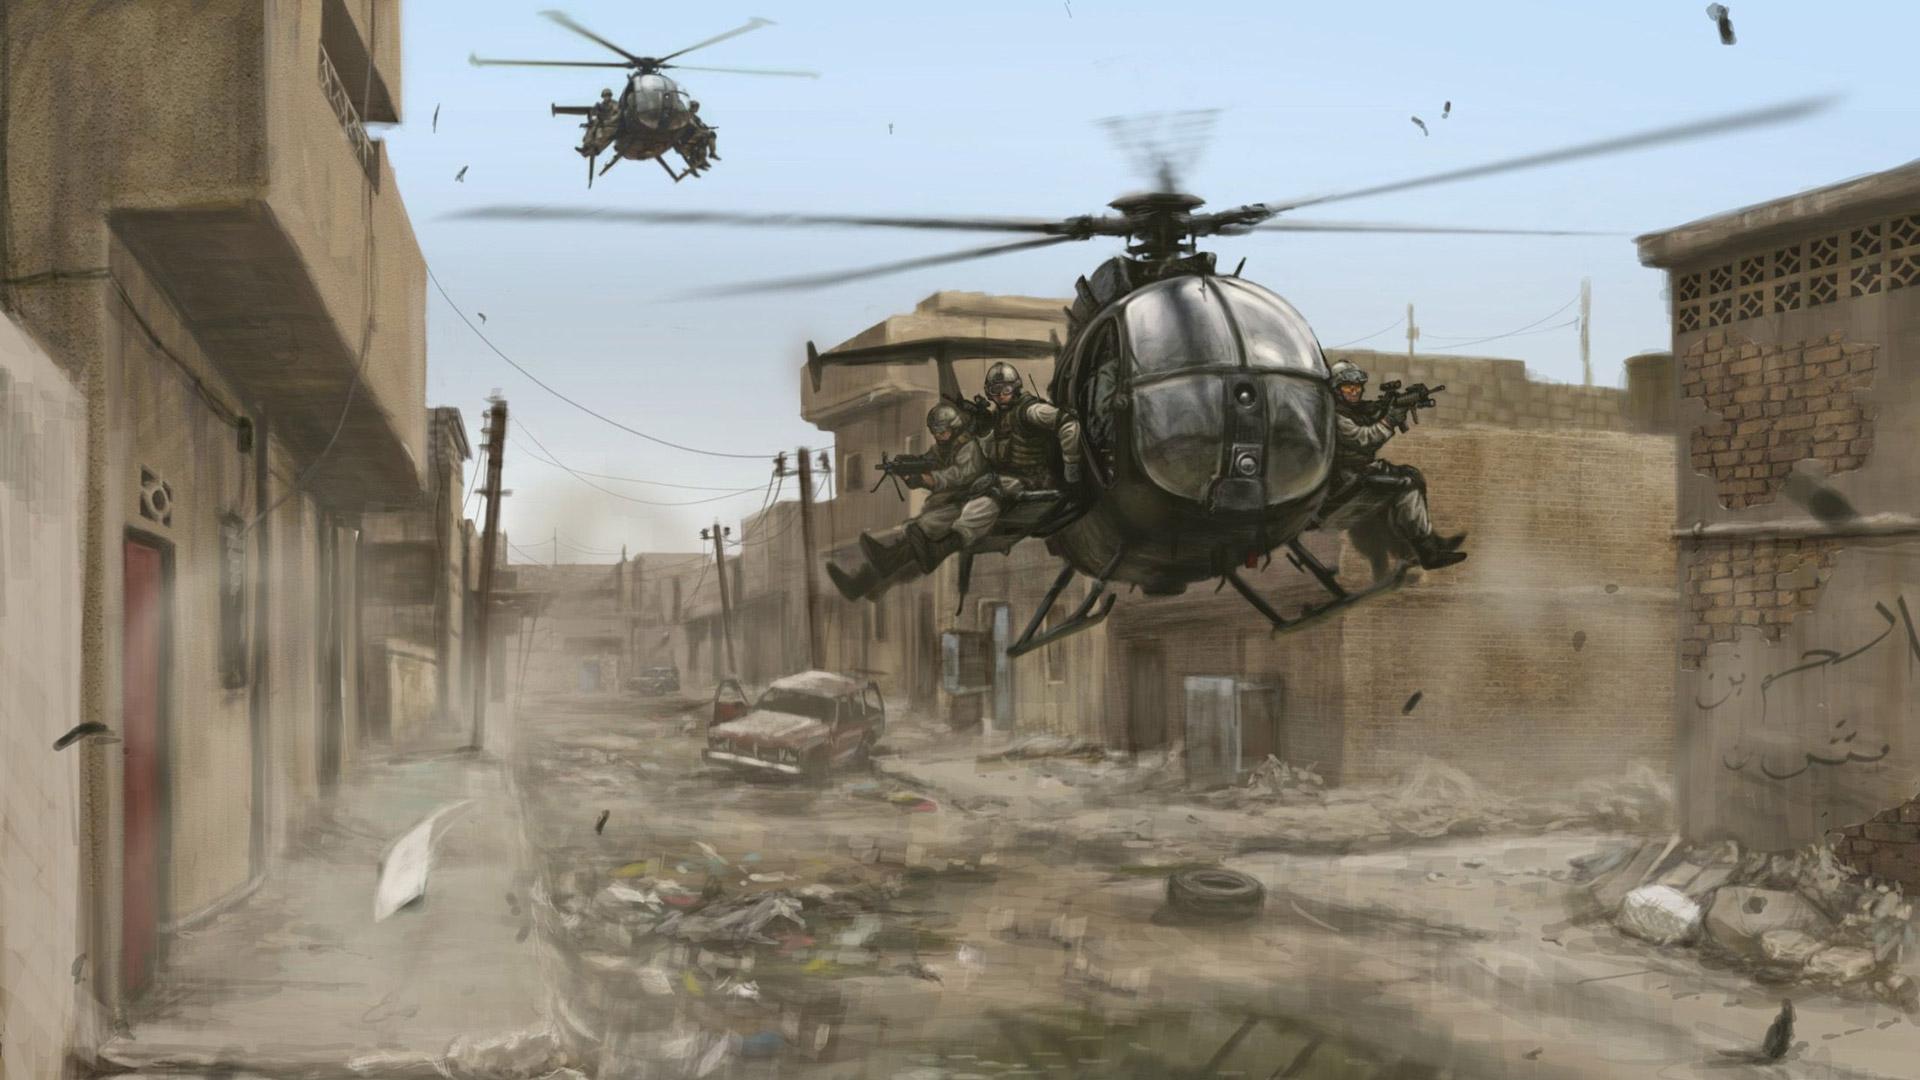 Delta Force: Black Hawk Down Wallpaper in 1920x1080